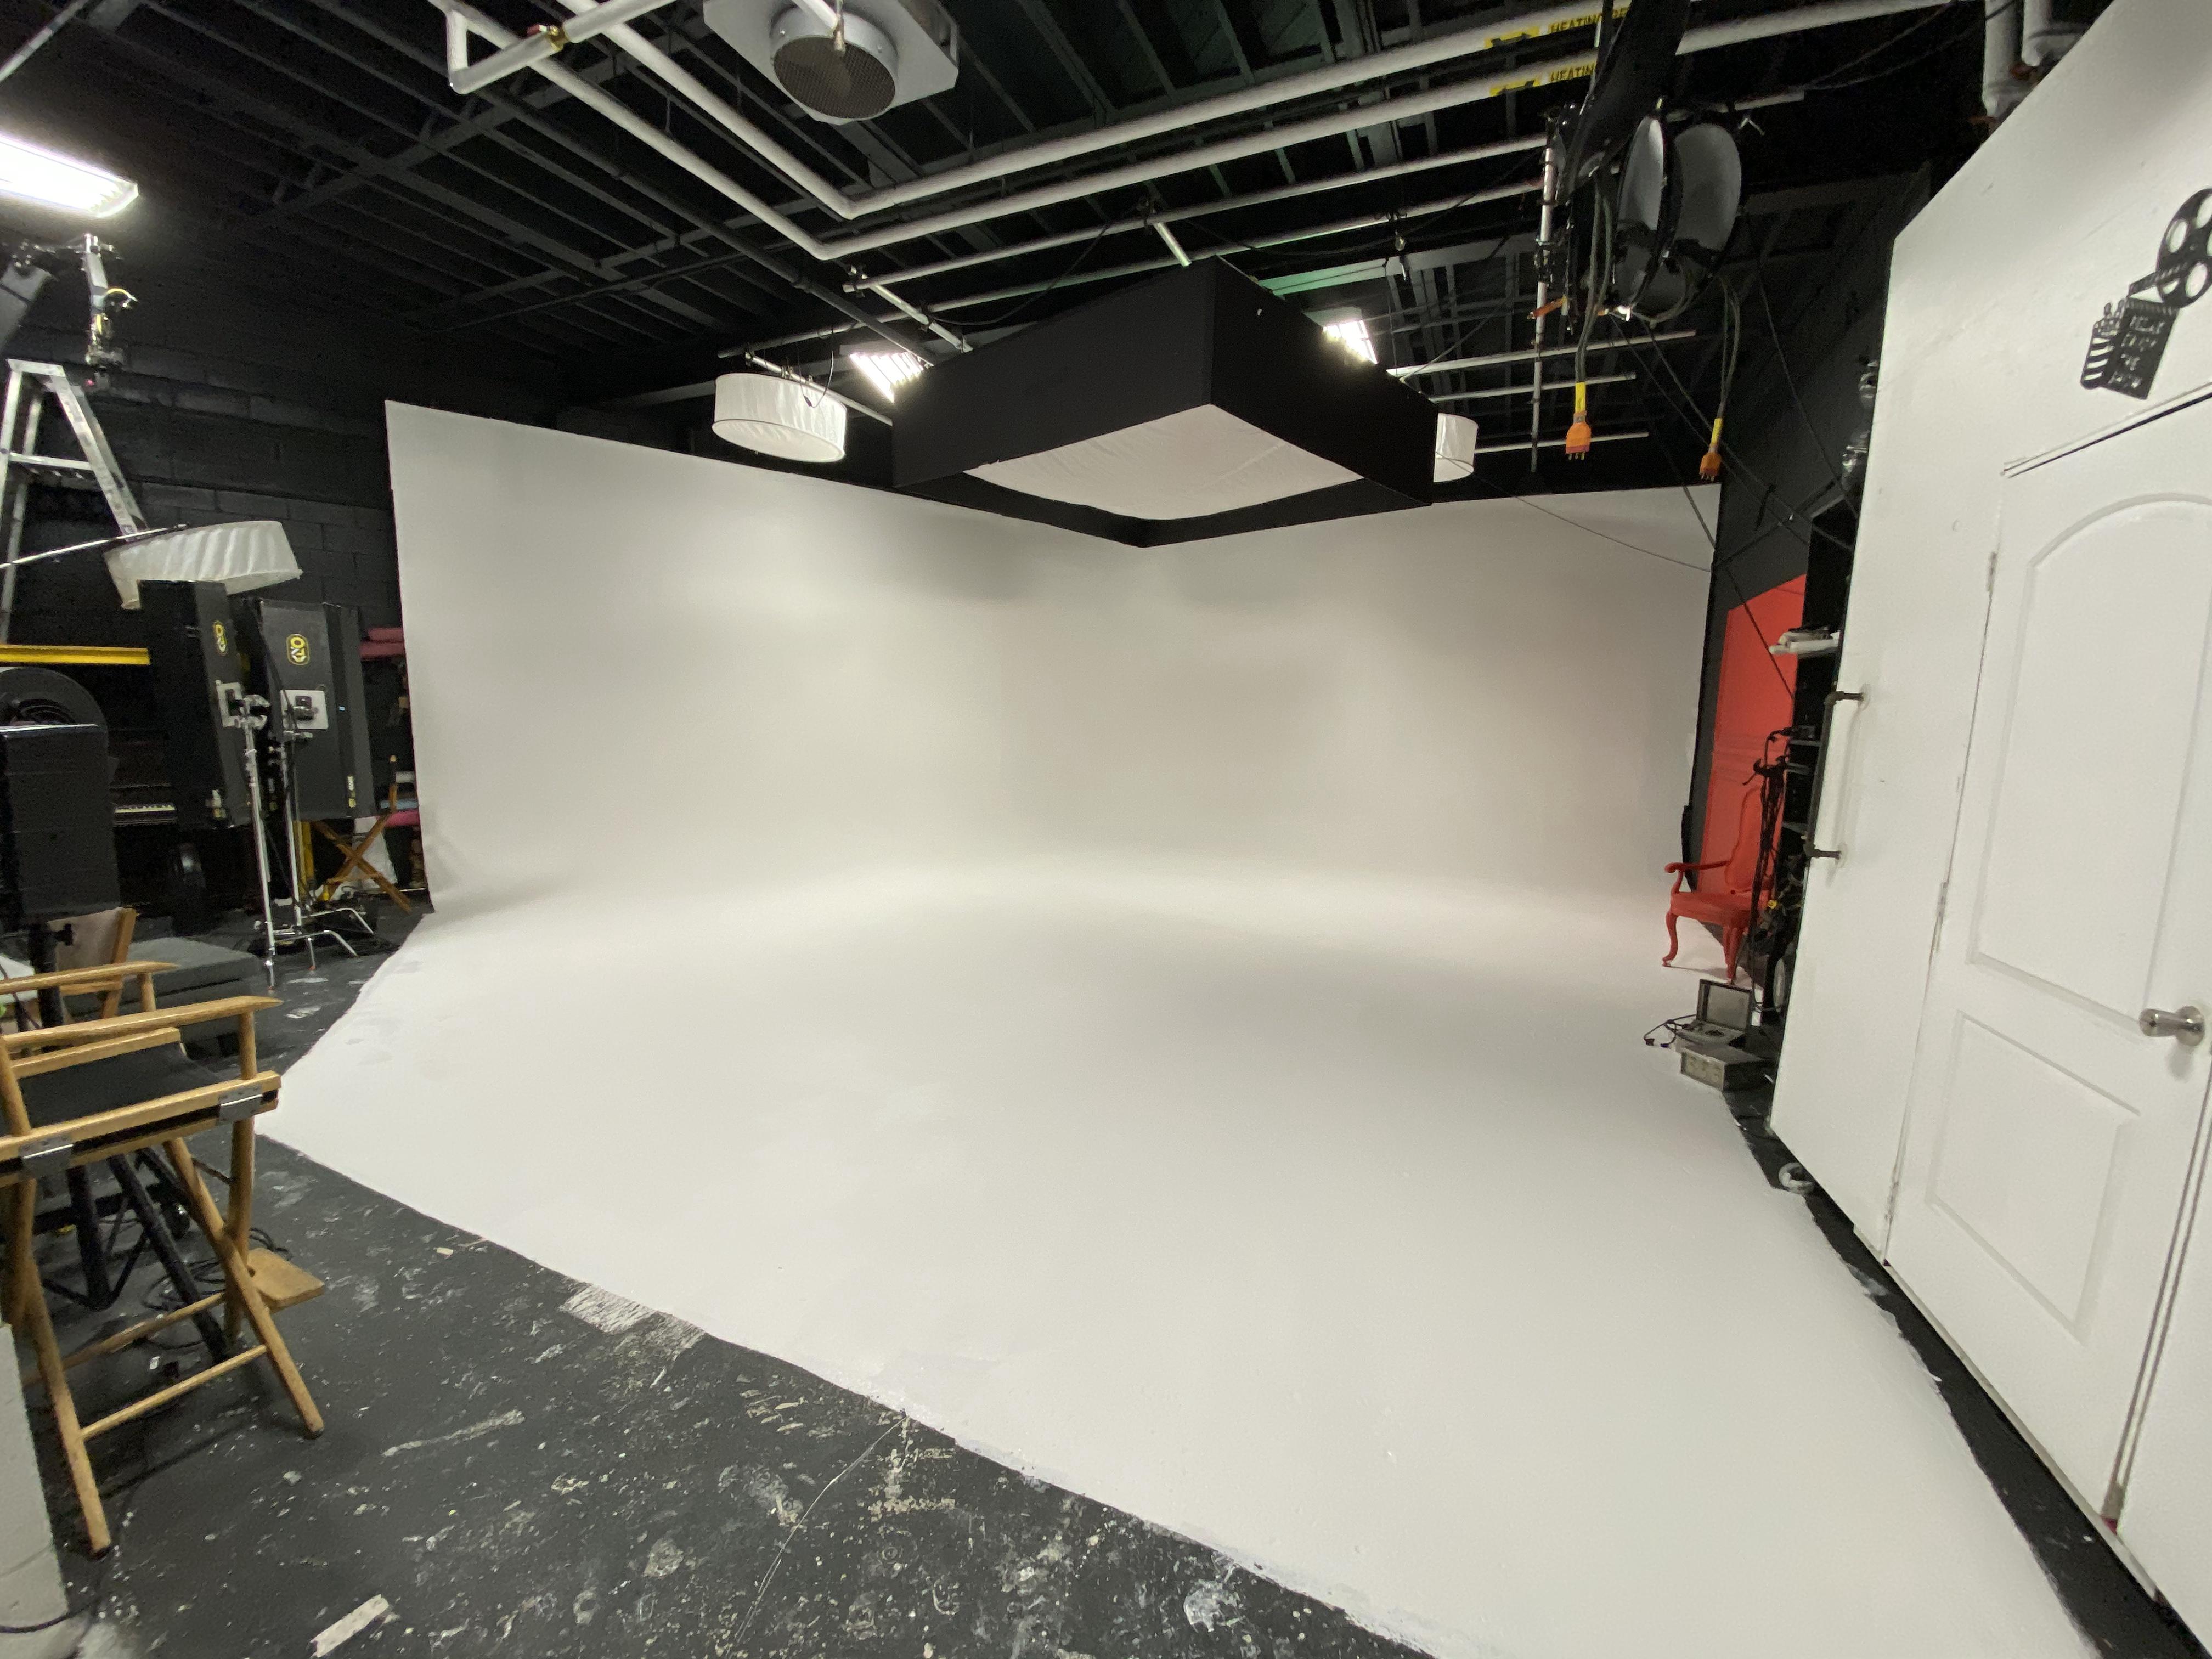 Cyclorama Studio Full Day Rental12 Hours